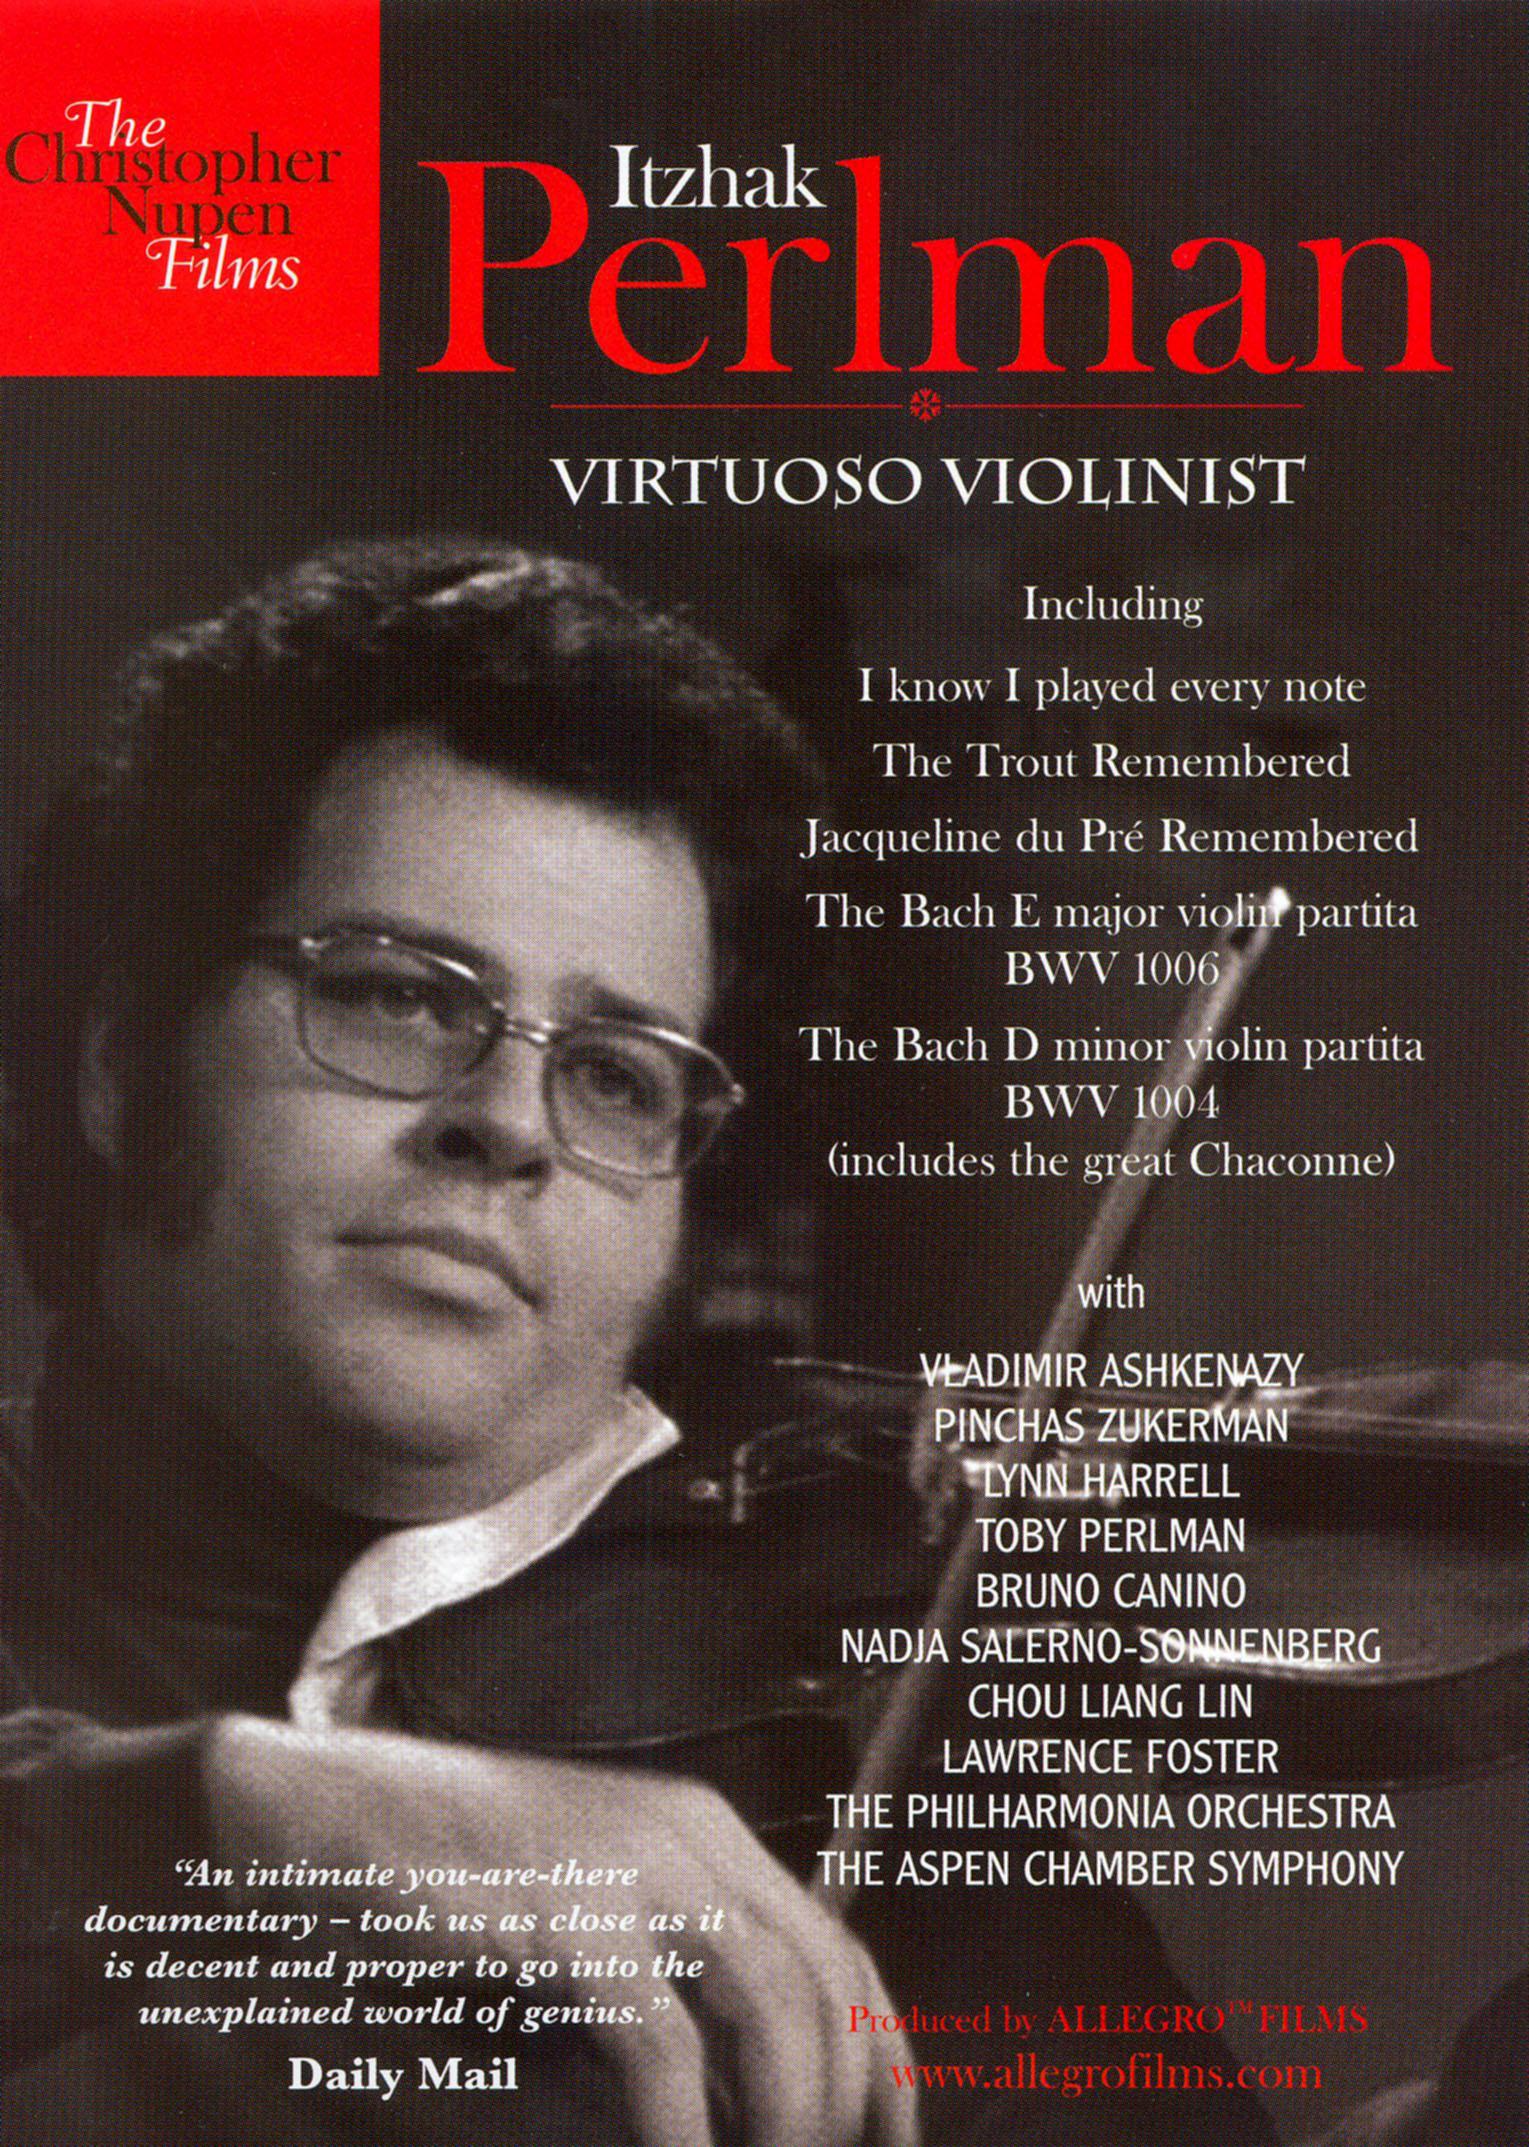 Itzhak Perlman: Virtuoso Violinist